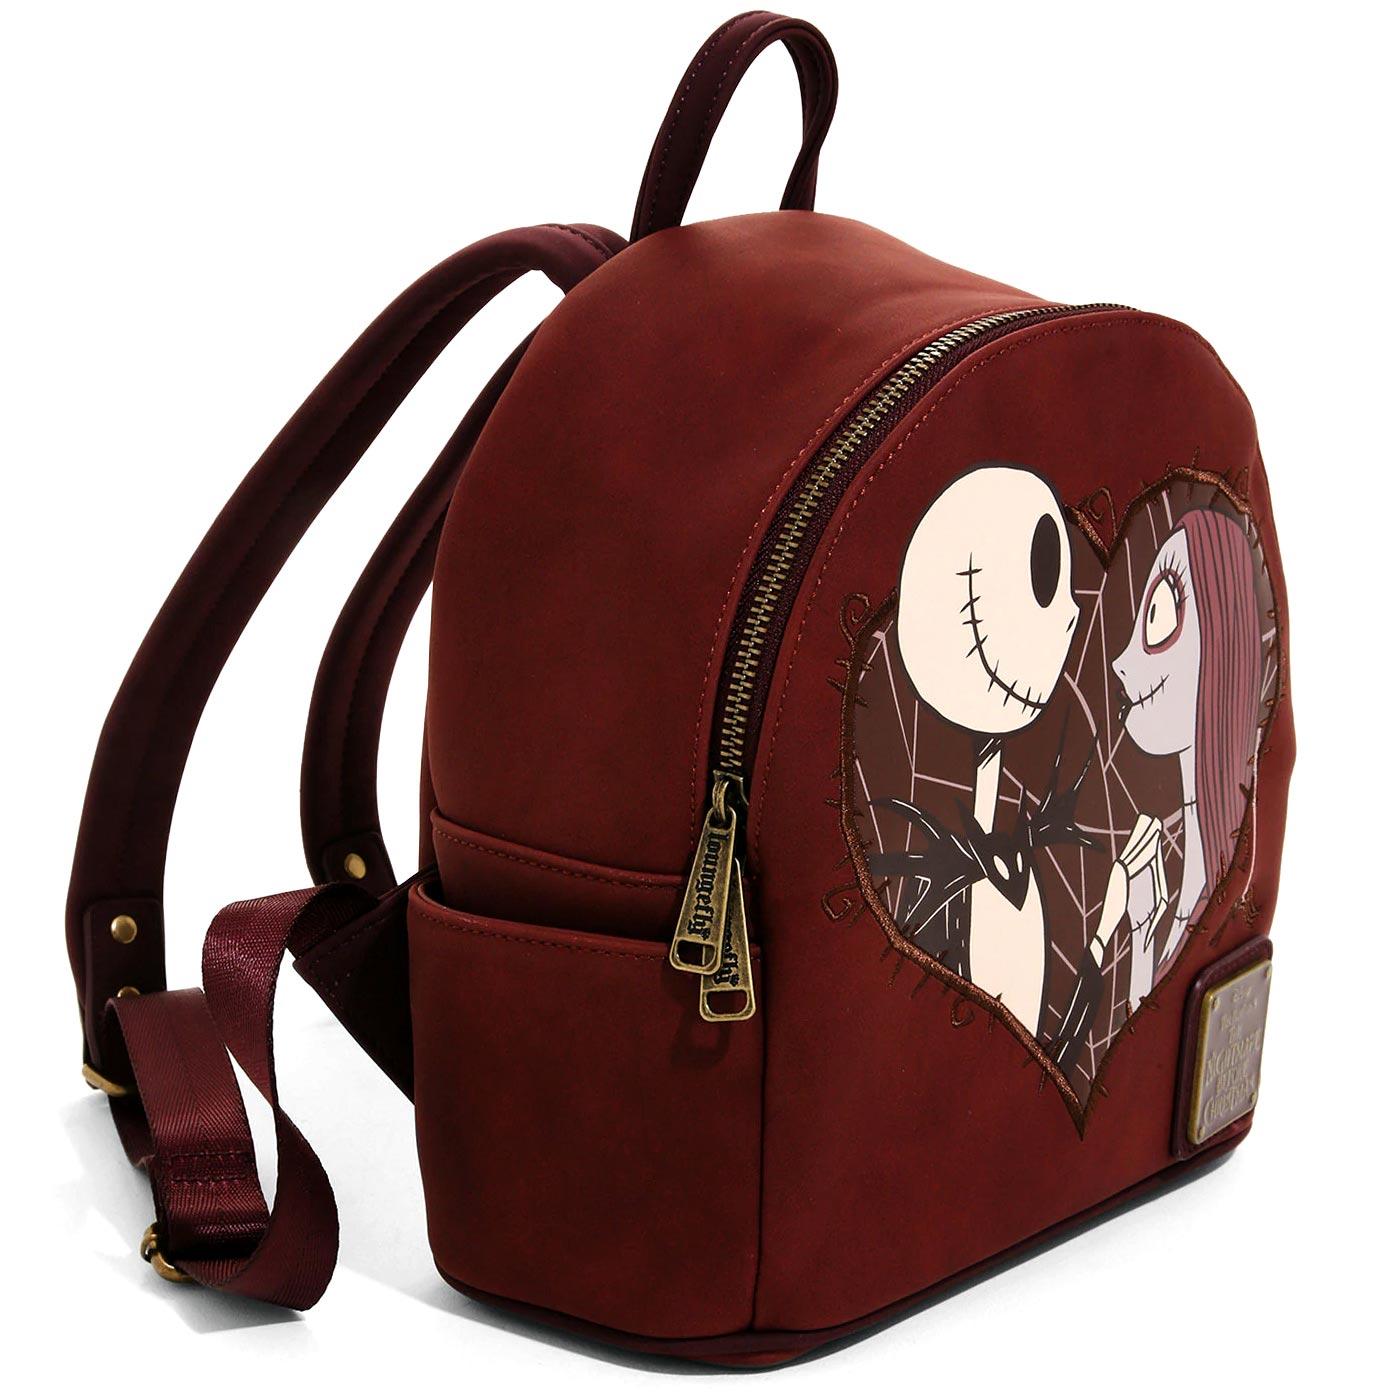 Hot Topic Nightmare Before Christmas Backpack.Nightmare Before Christmas Simply Meant To Be Mini Backpack